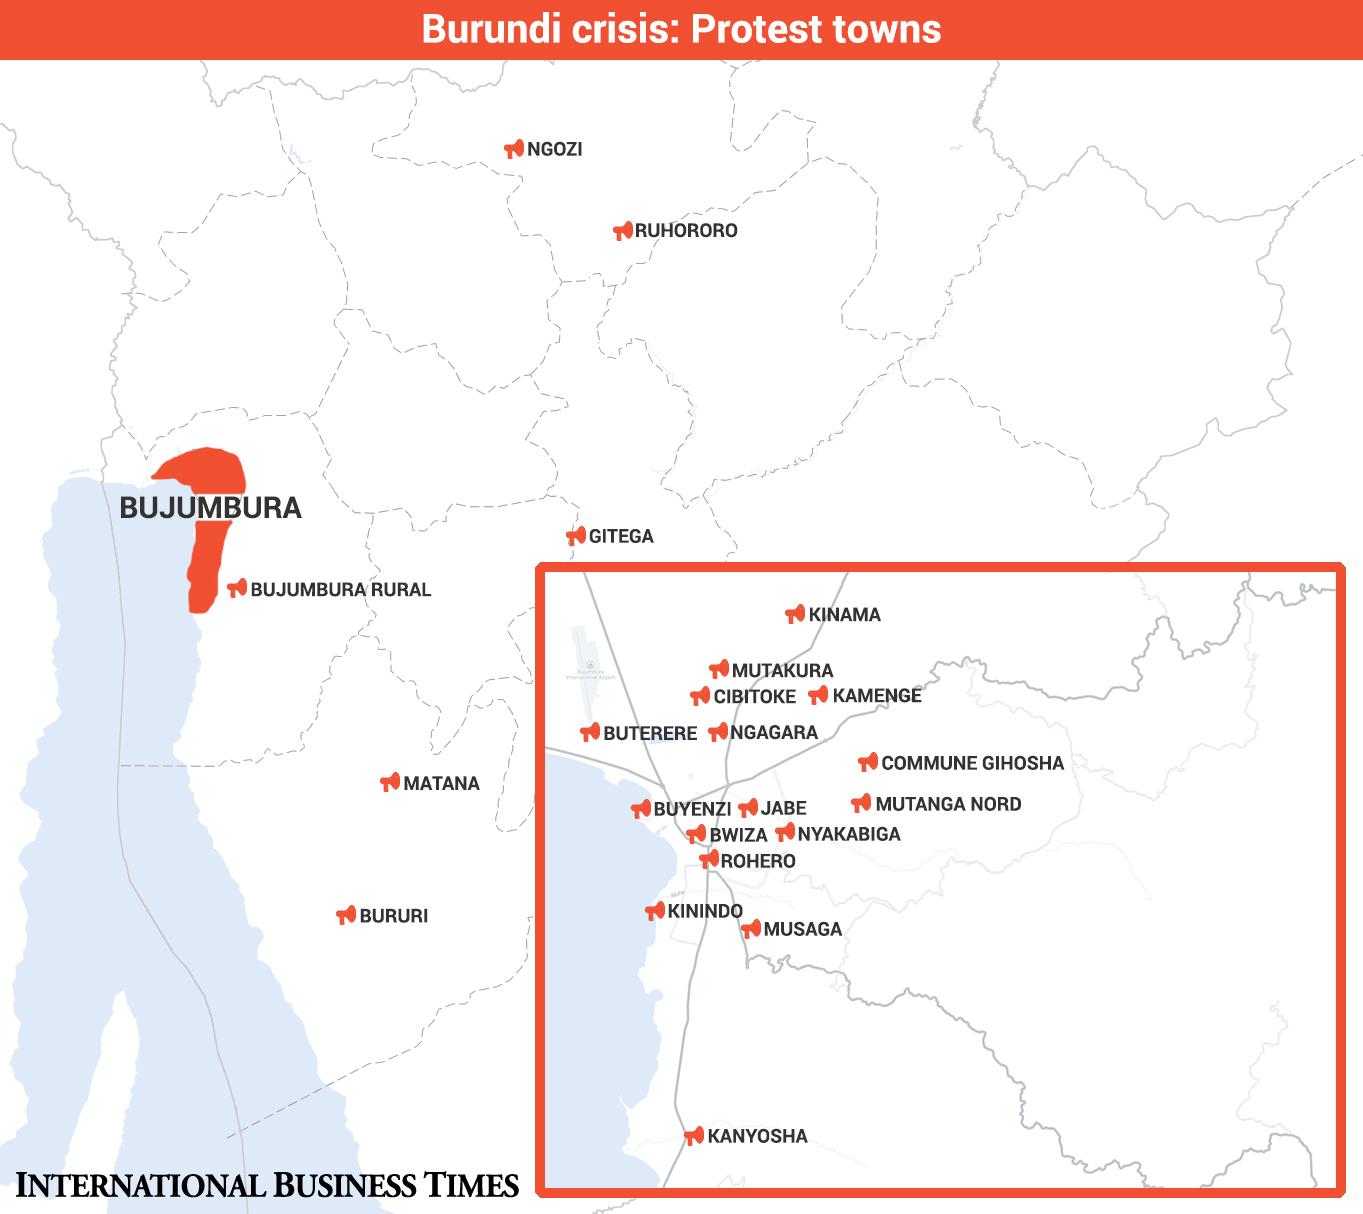 Burundi protest towns